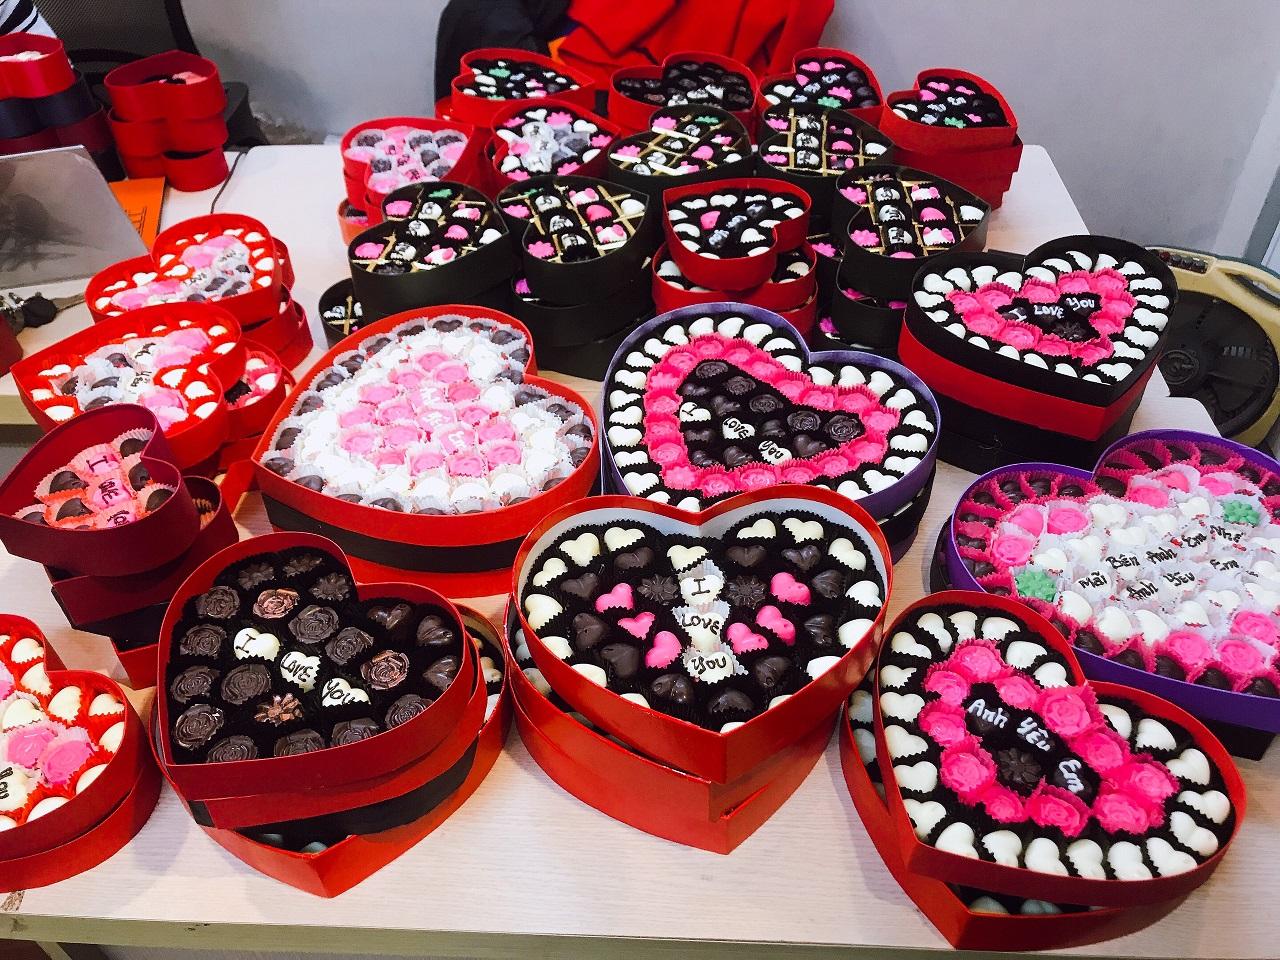 Socola valentine 2022 ( NEWWW)